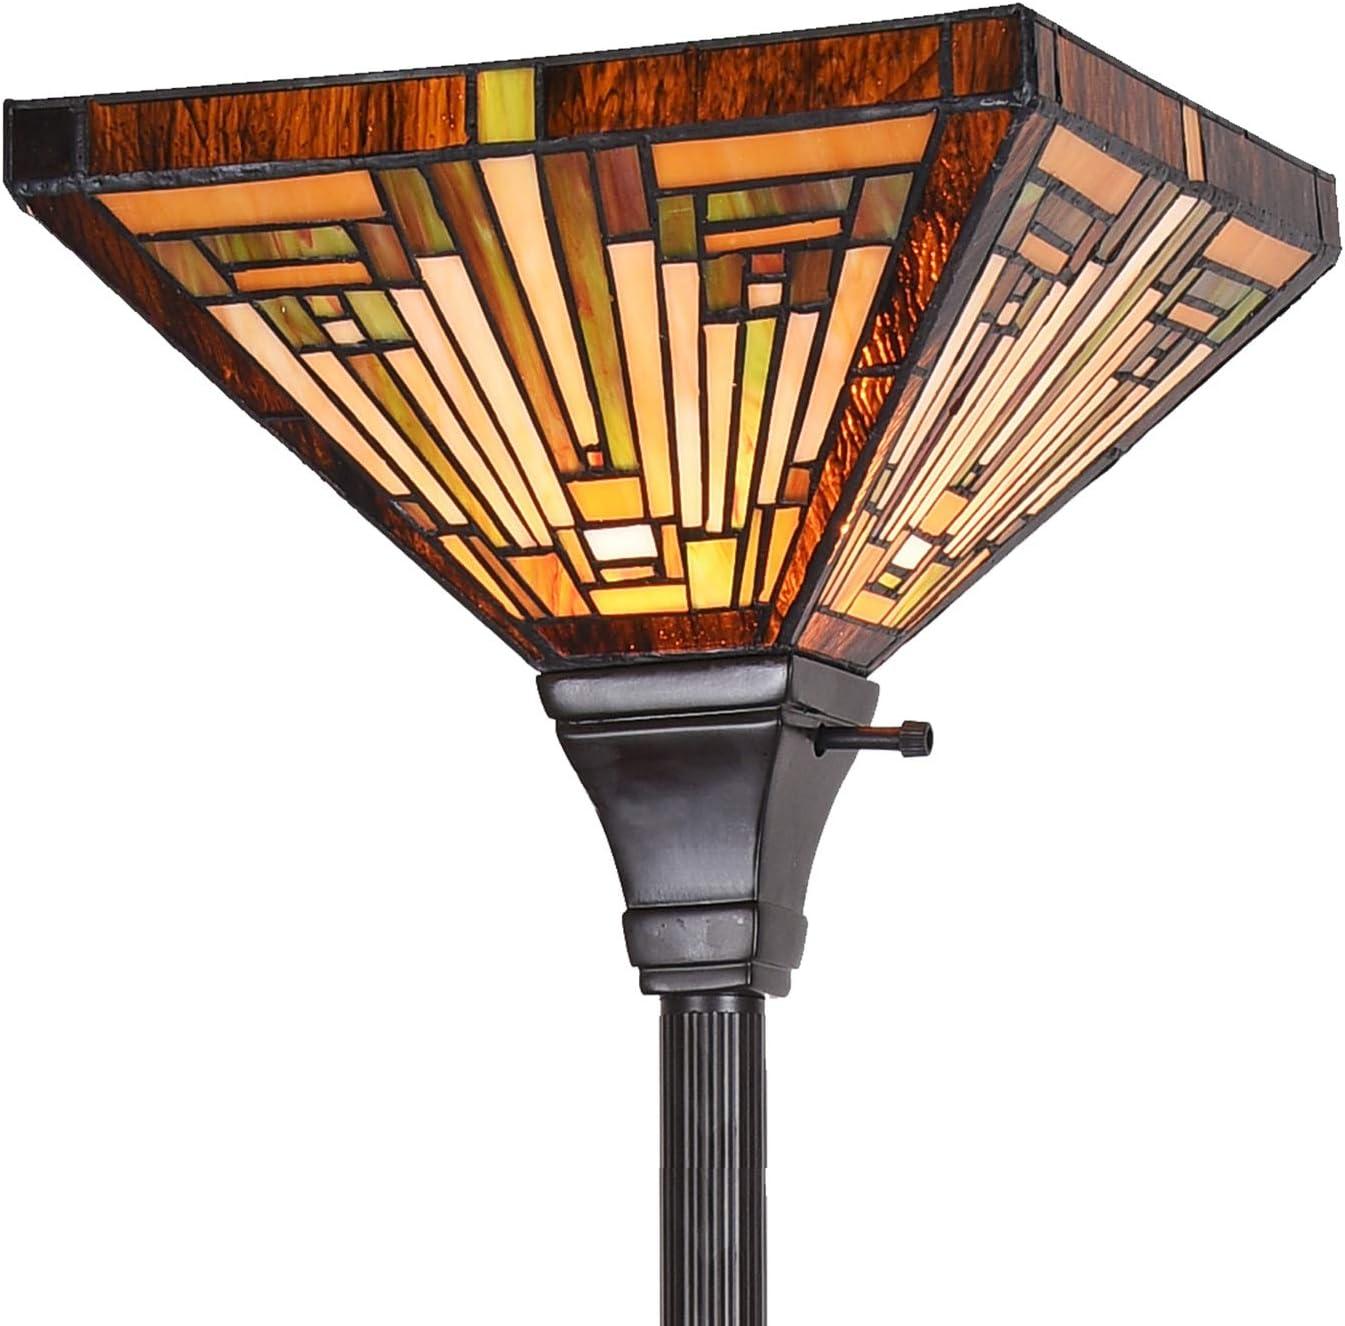 Artzone Mail order cheap Tiffany Torchiere Floor Lamp Arlington Mall W12 H70 Inch Missio Antique